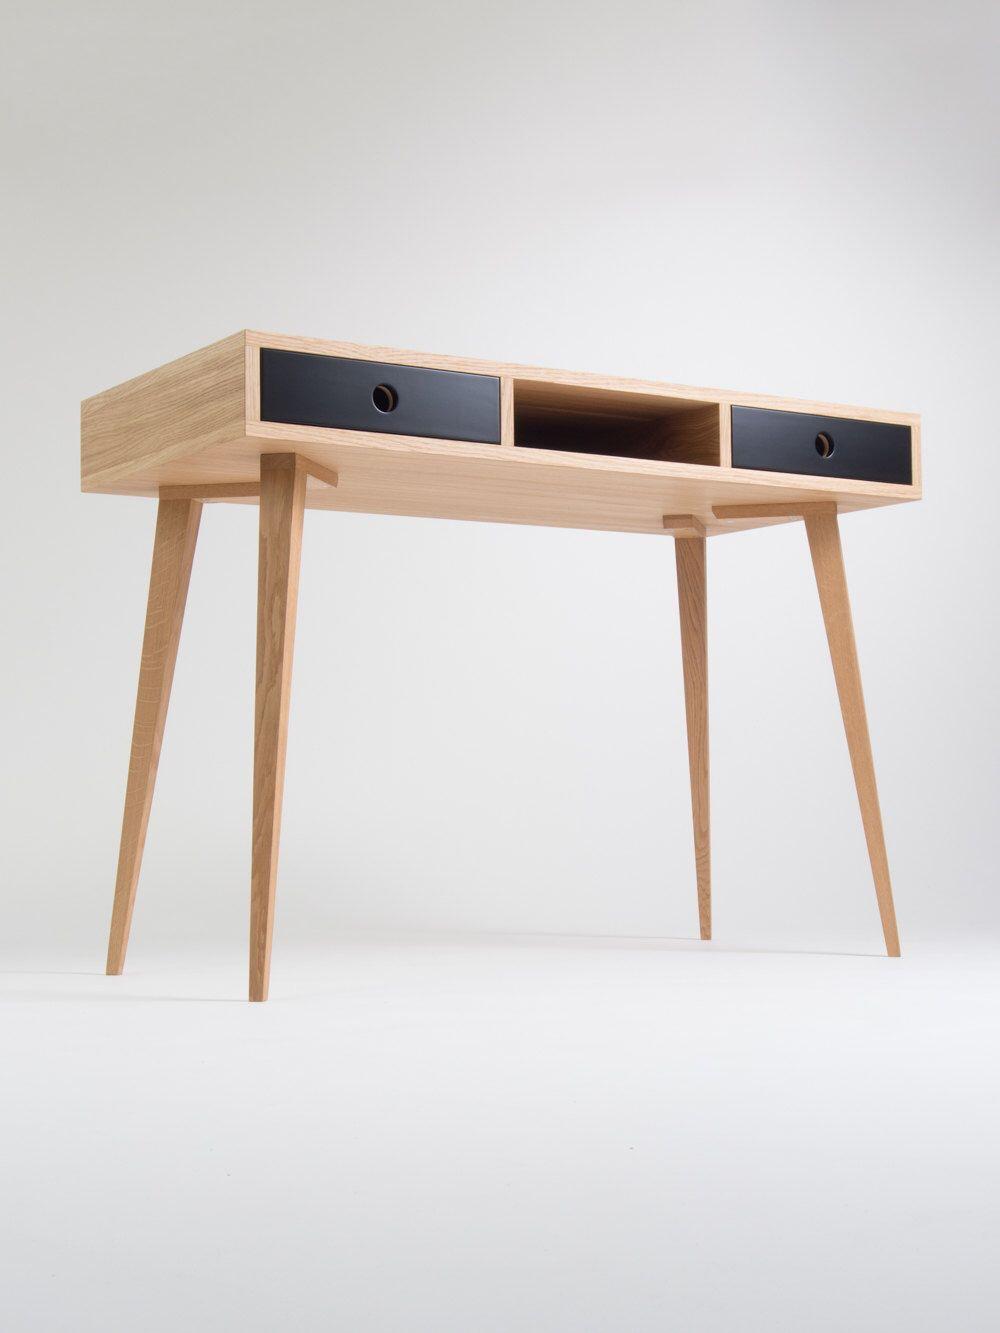 Office Desk Mid Century Modern Bureau Small Computer Table Made